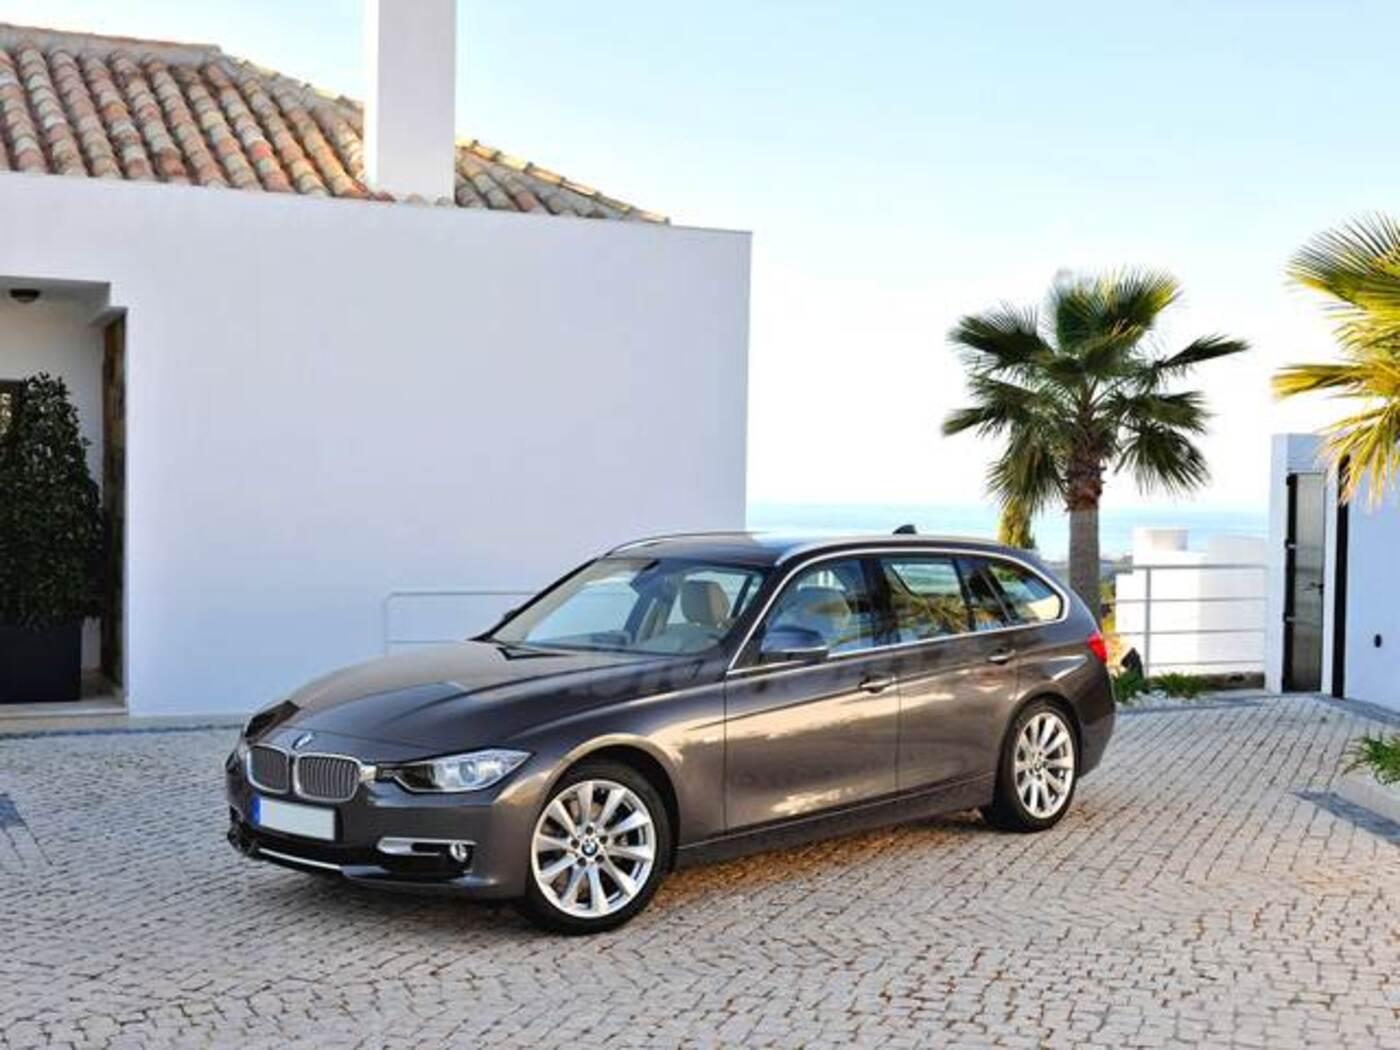 PARASOLE BMW serie 3 f31 Touring 2012-6 pezzi